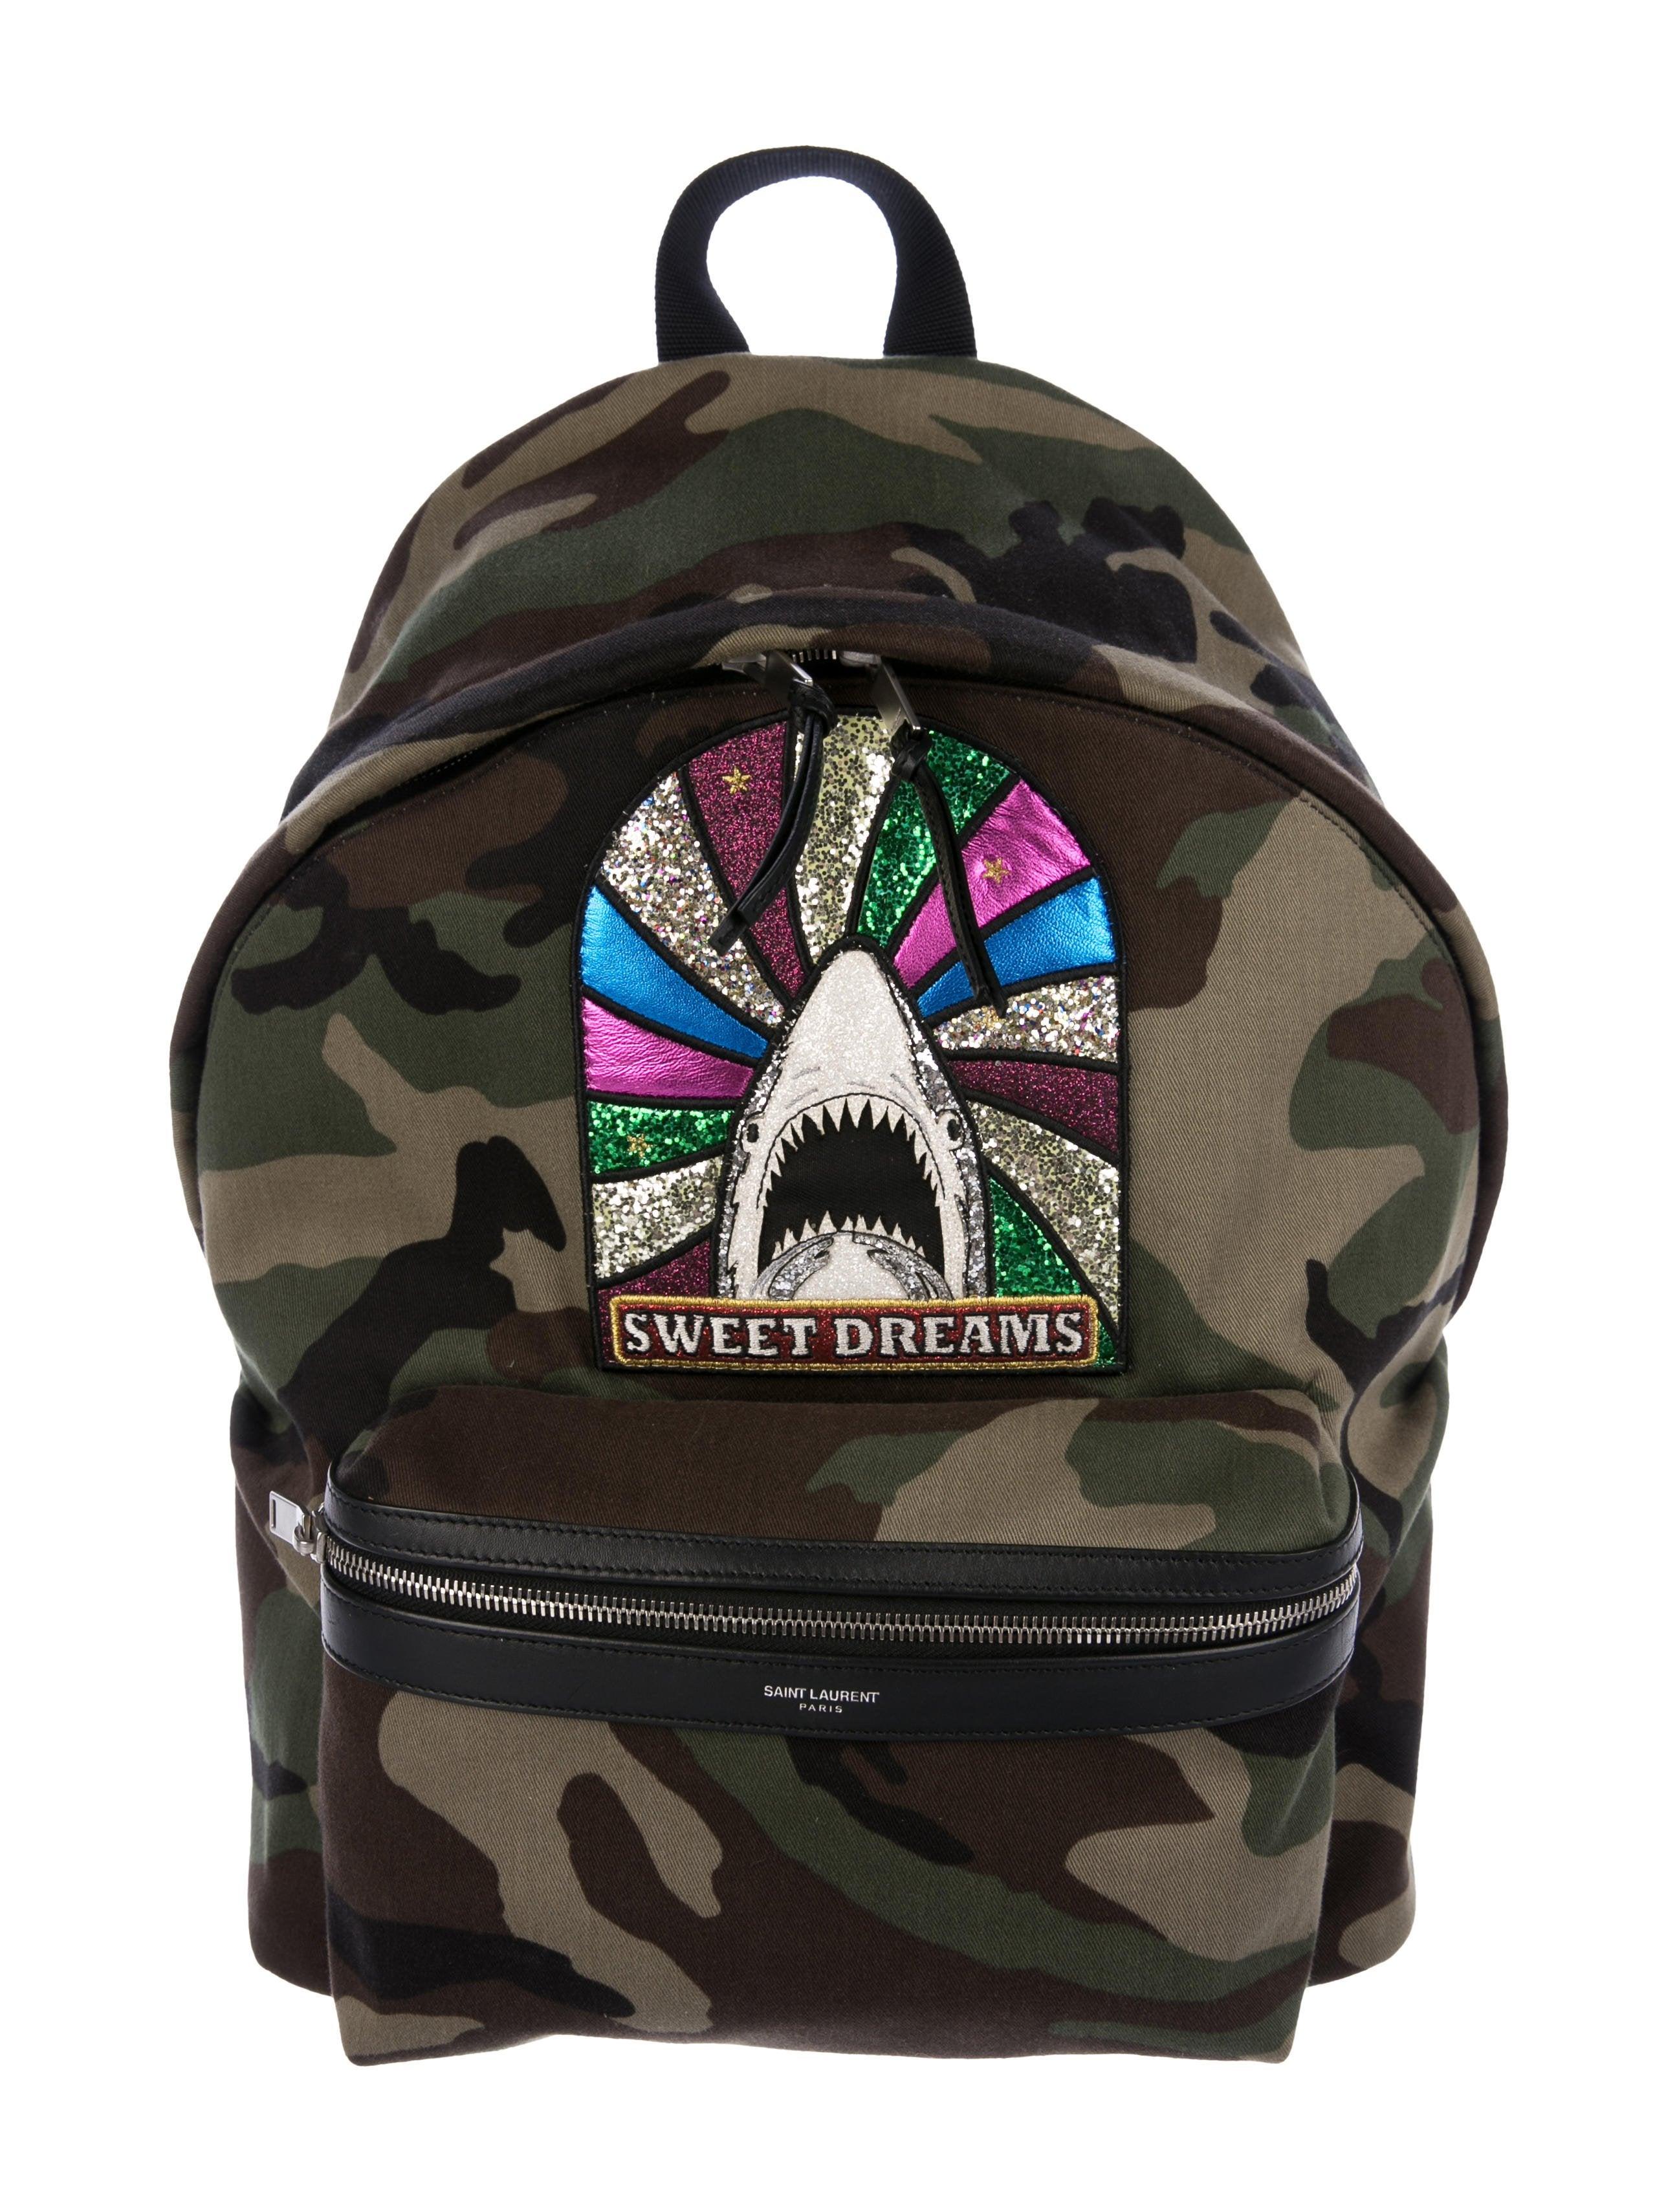 97e2c78535 Saint Laurent Giant City Sweet Dreams Backpack - Bags - SNT44640 ...